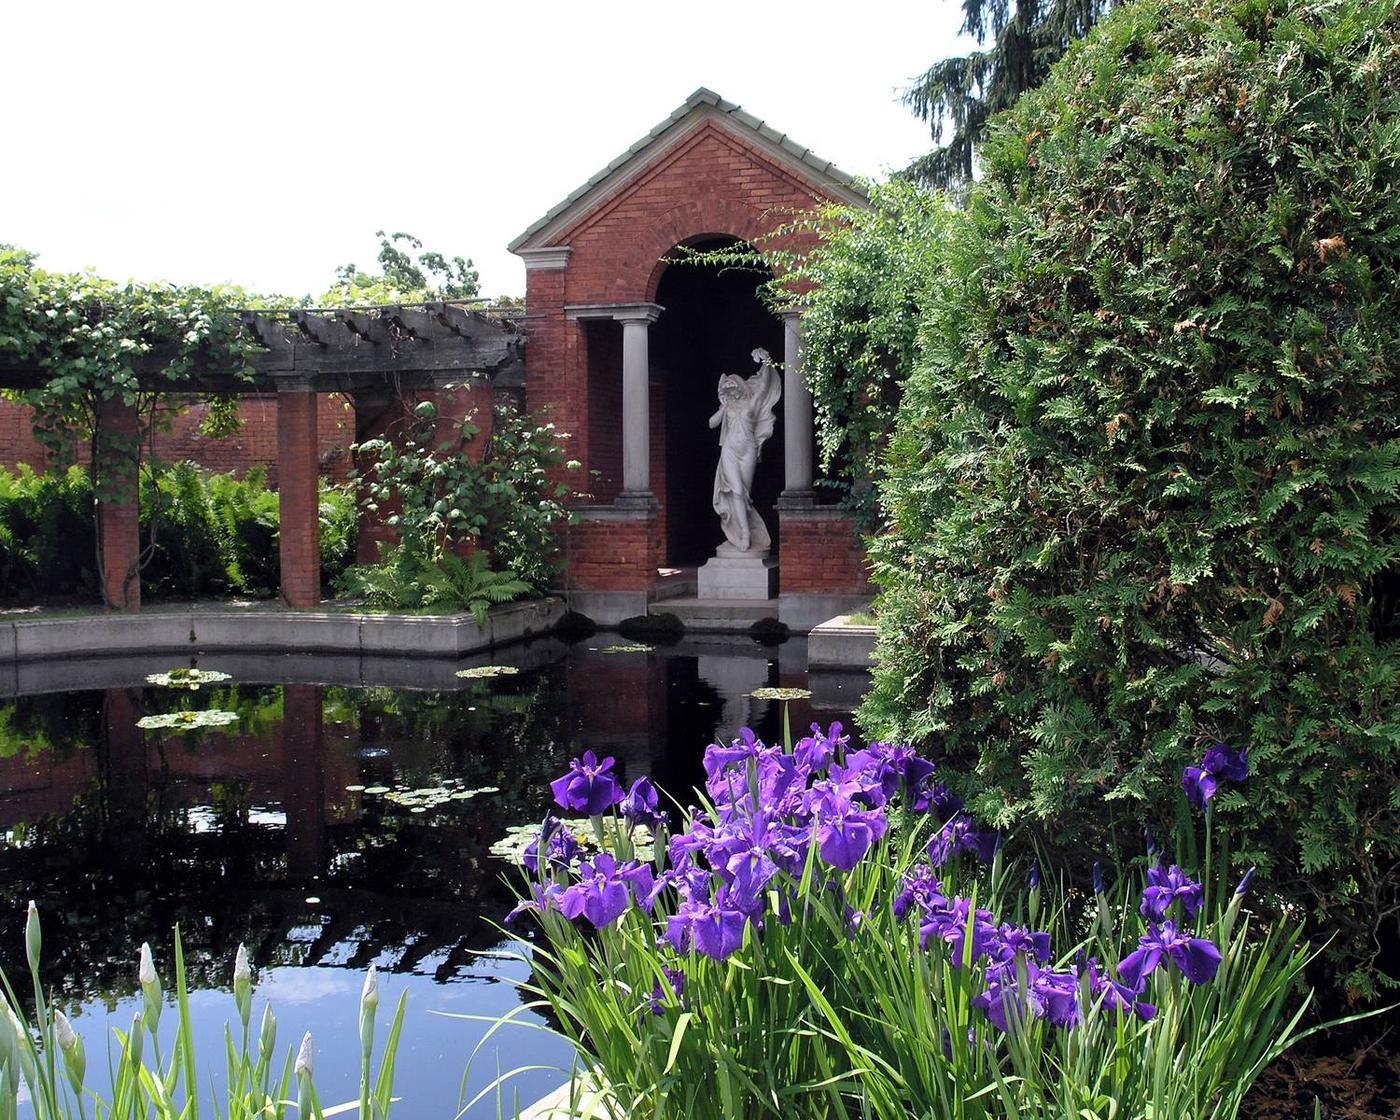 Italian Garden reflecting pond